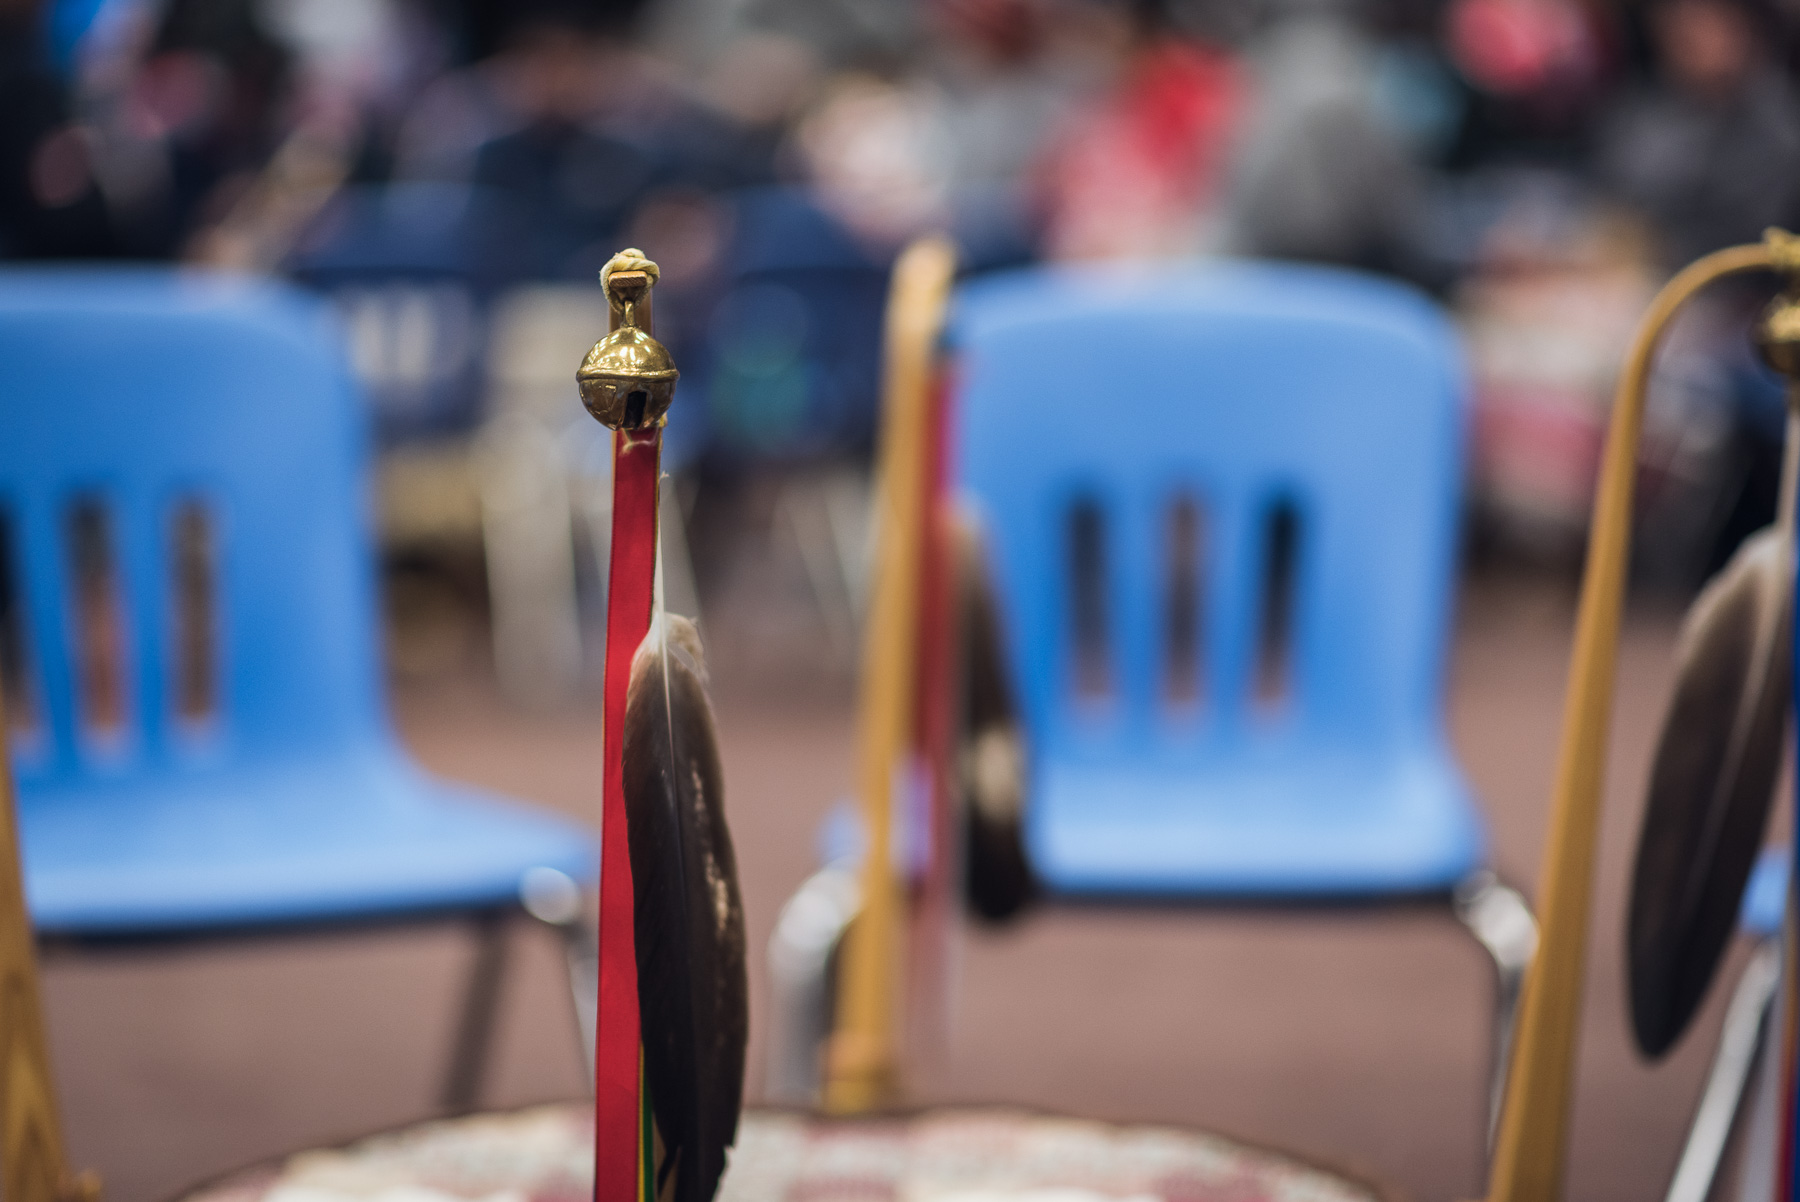 31st-Annual-LUNSA-Powwow-Blog-20.jpg